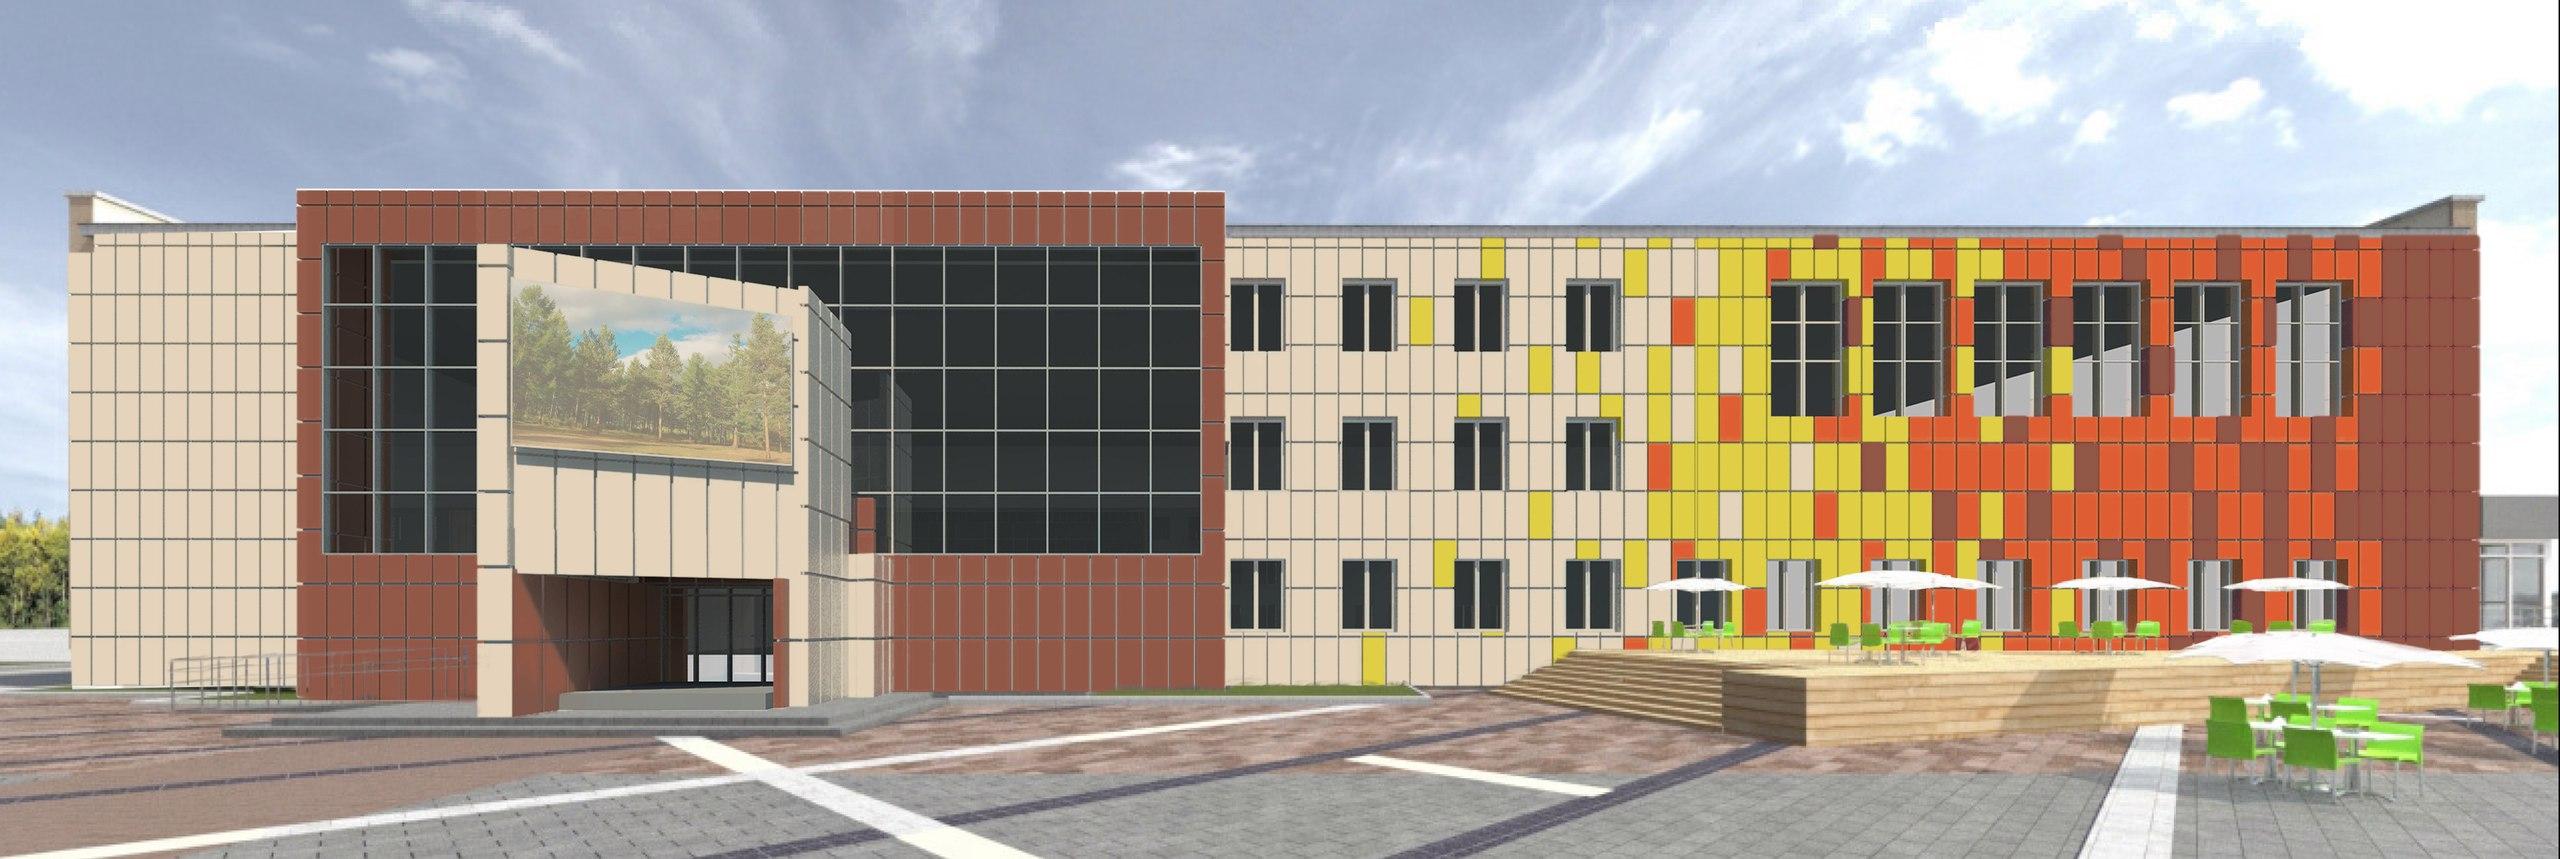 проект фасад Дворца молодежи, Чайковский, 2017 год